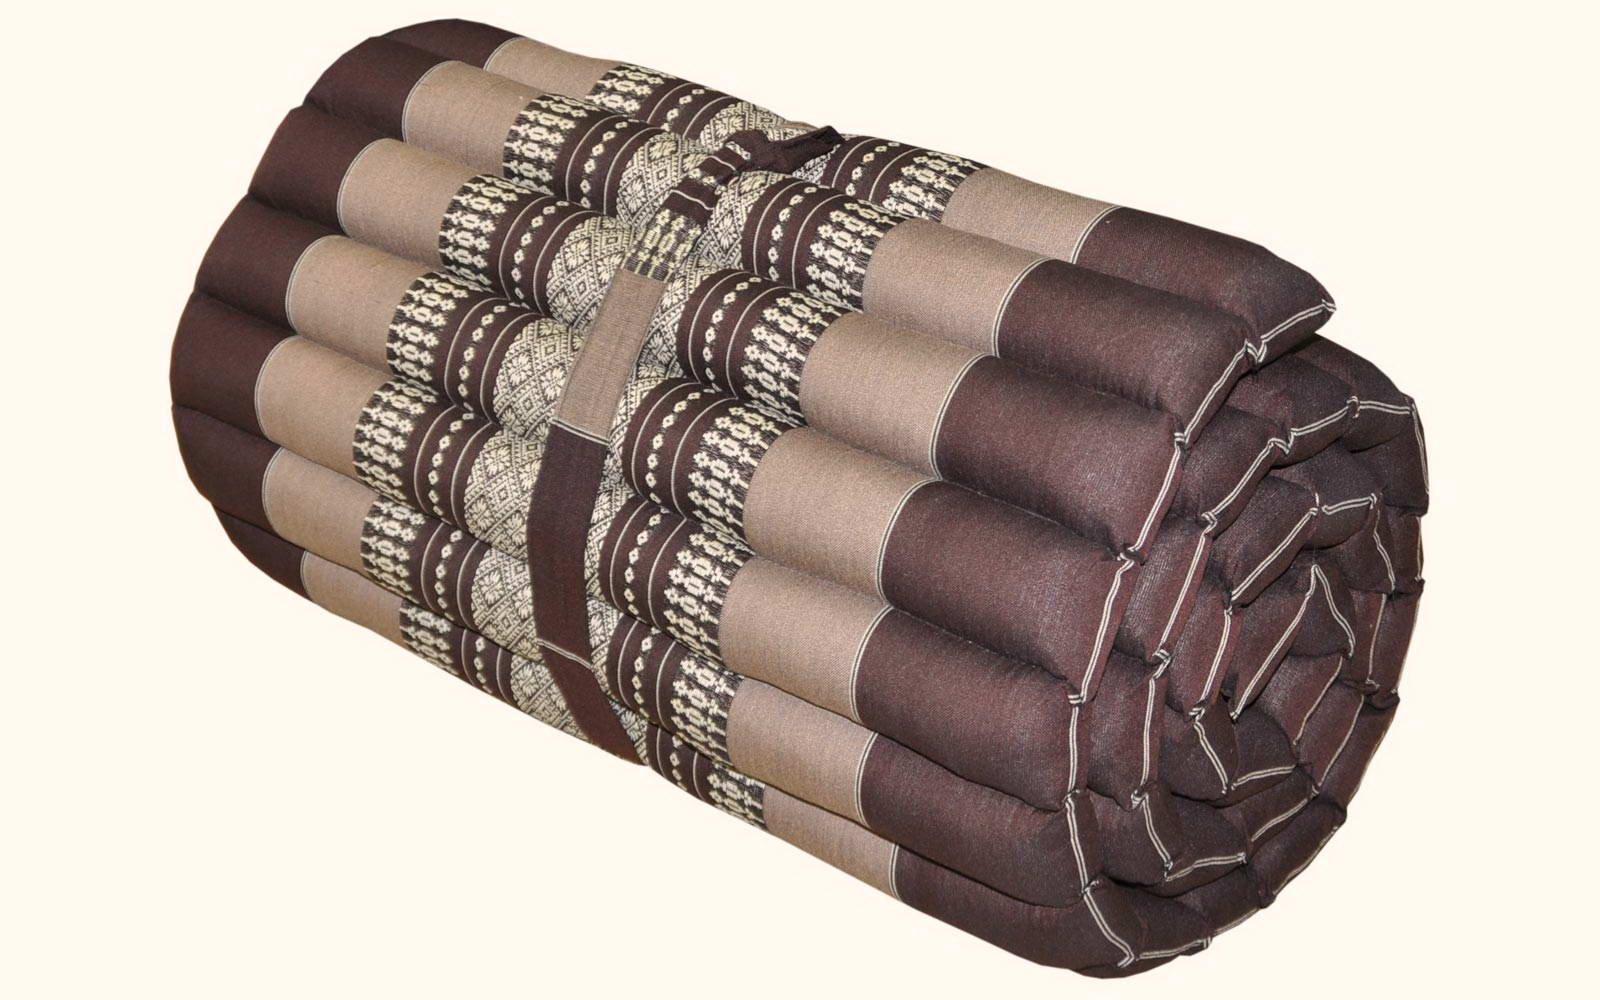 Thai mattress small size (55/180), brown, relaxation, beach cushion, pool, meditation, yoga (82413)